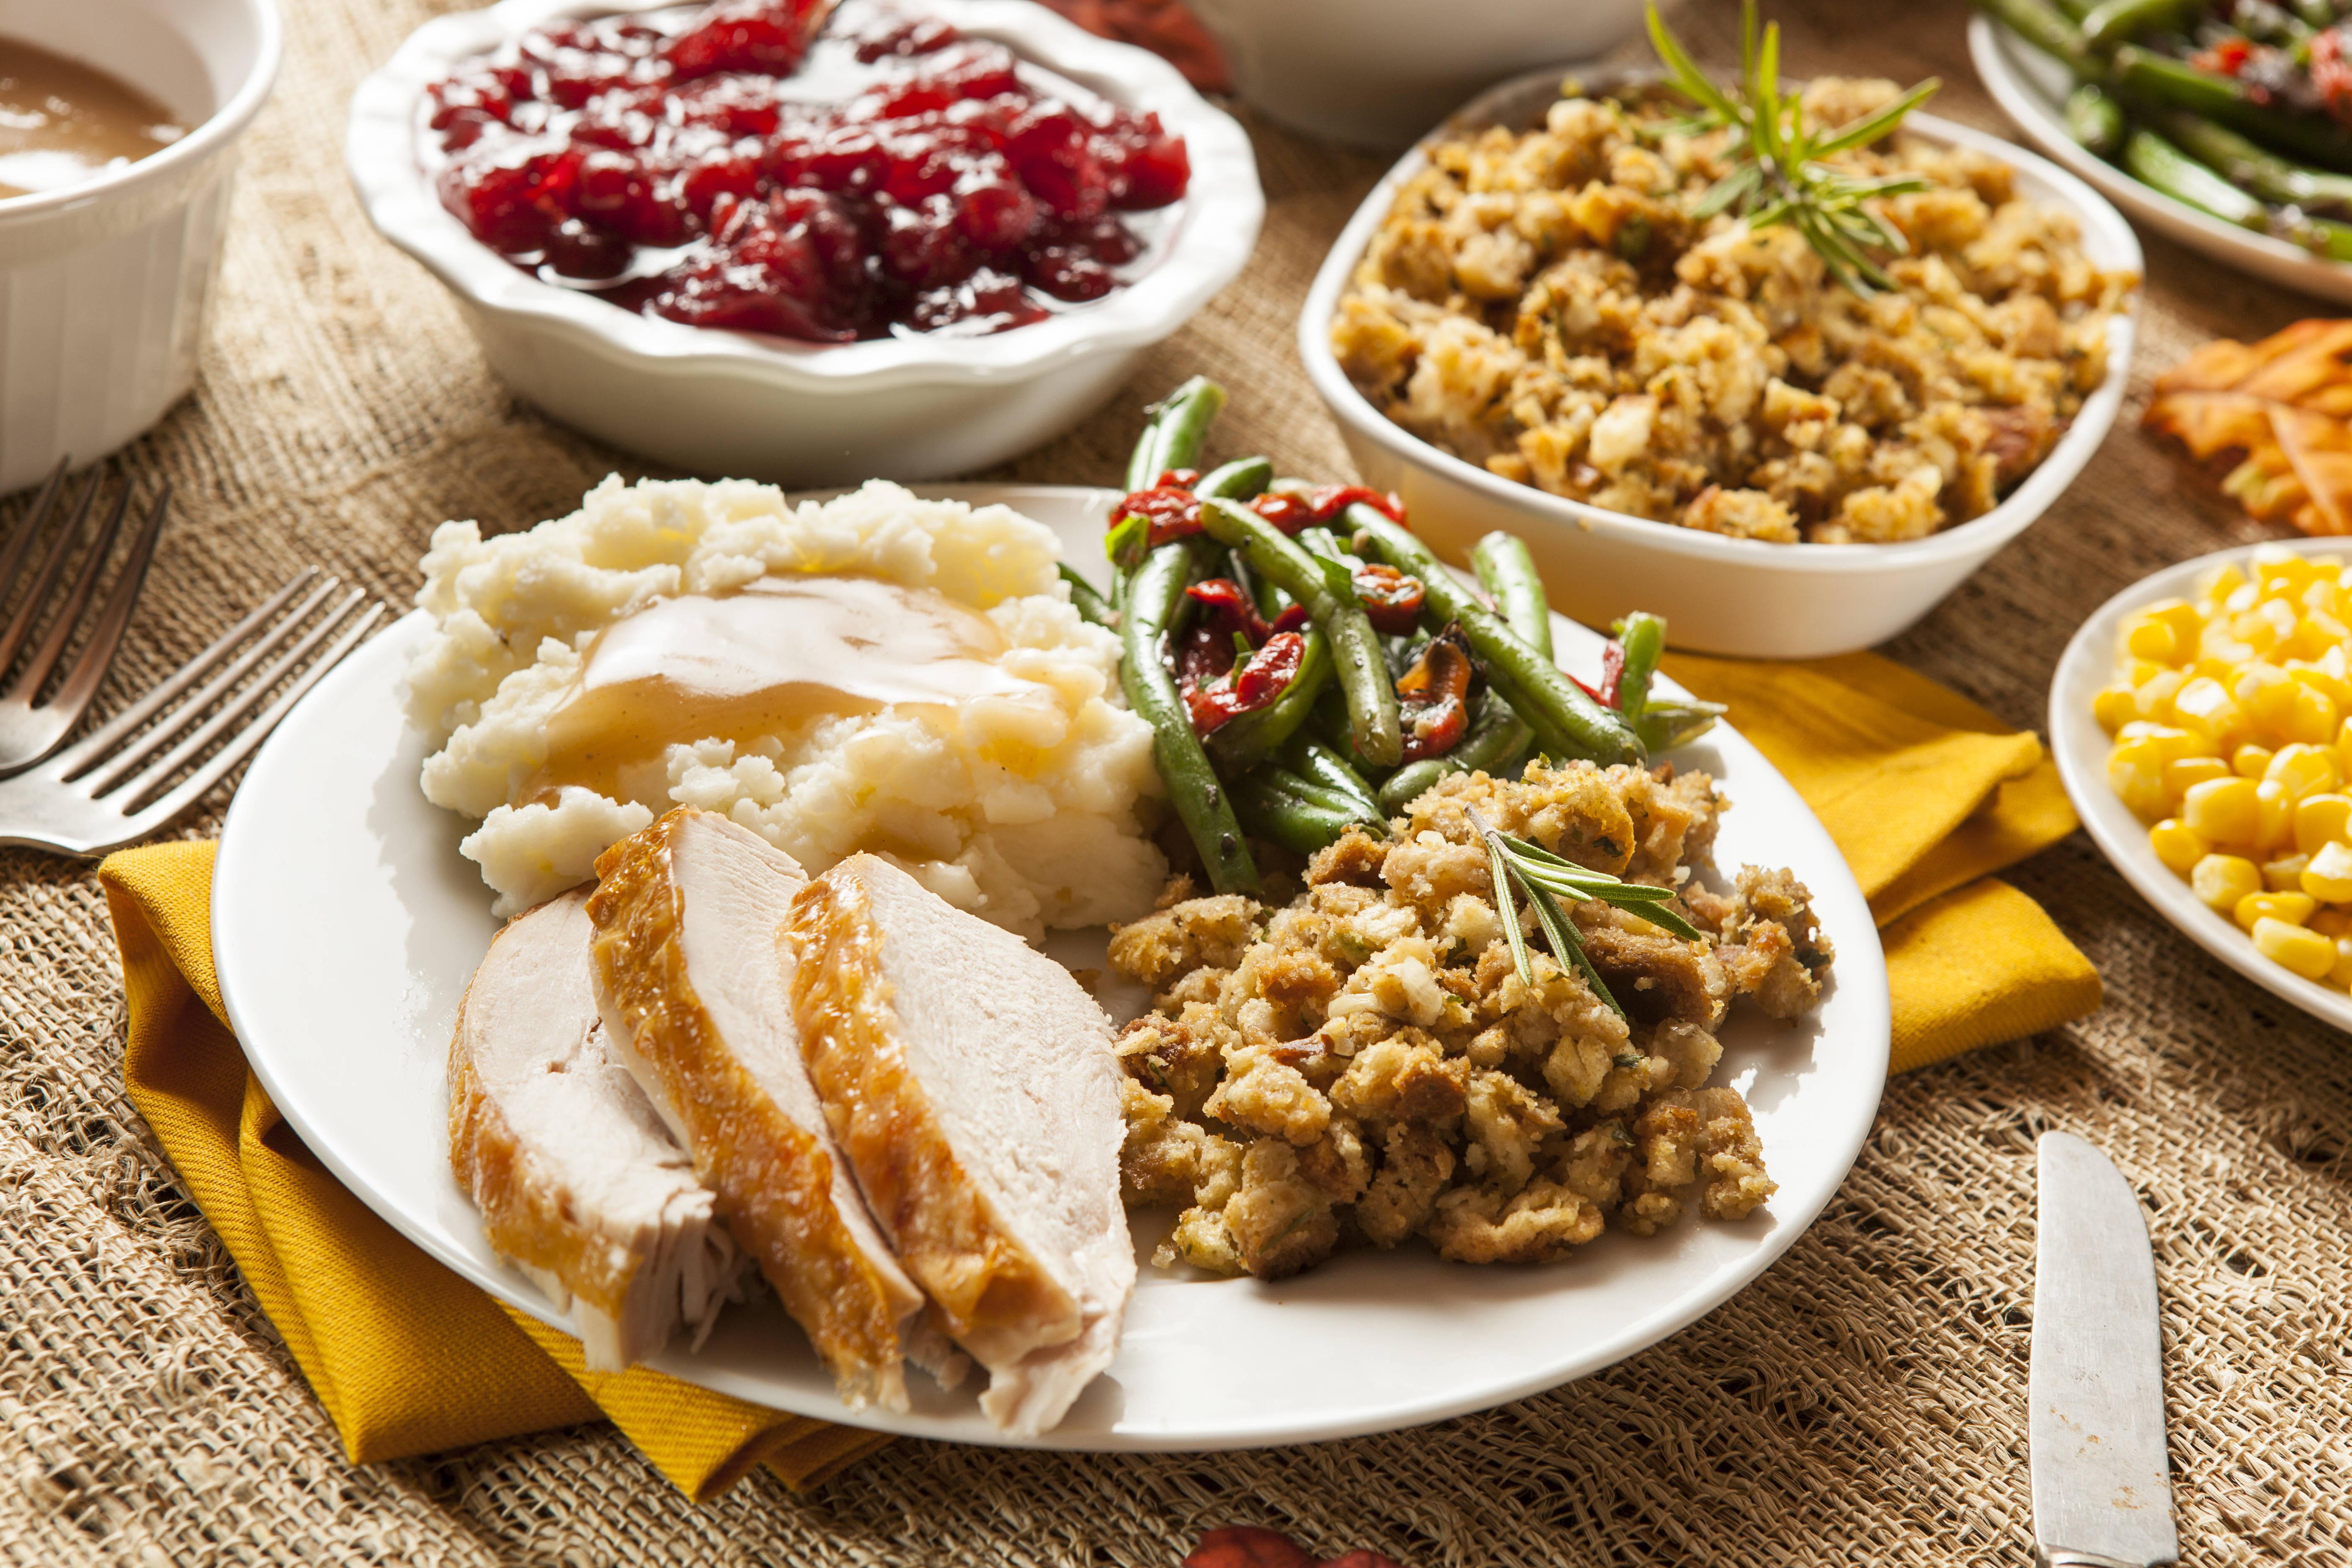 Thanksgiving Dinner Menu Ideas  THANKSGIVING MENU IDEAS